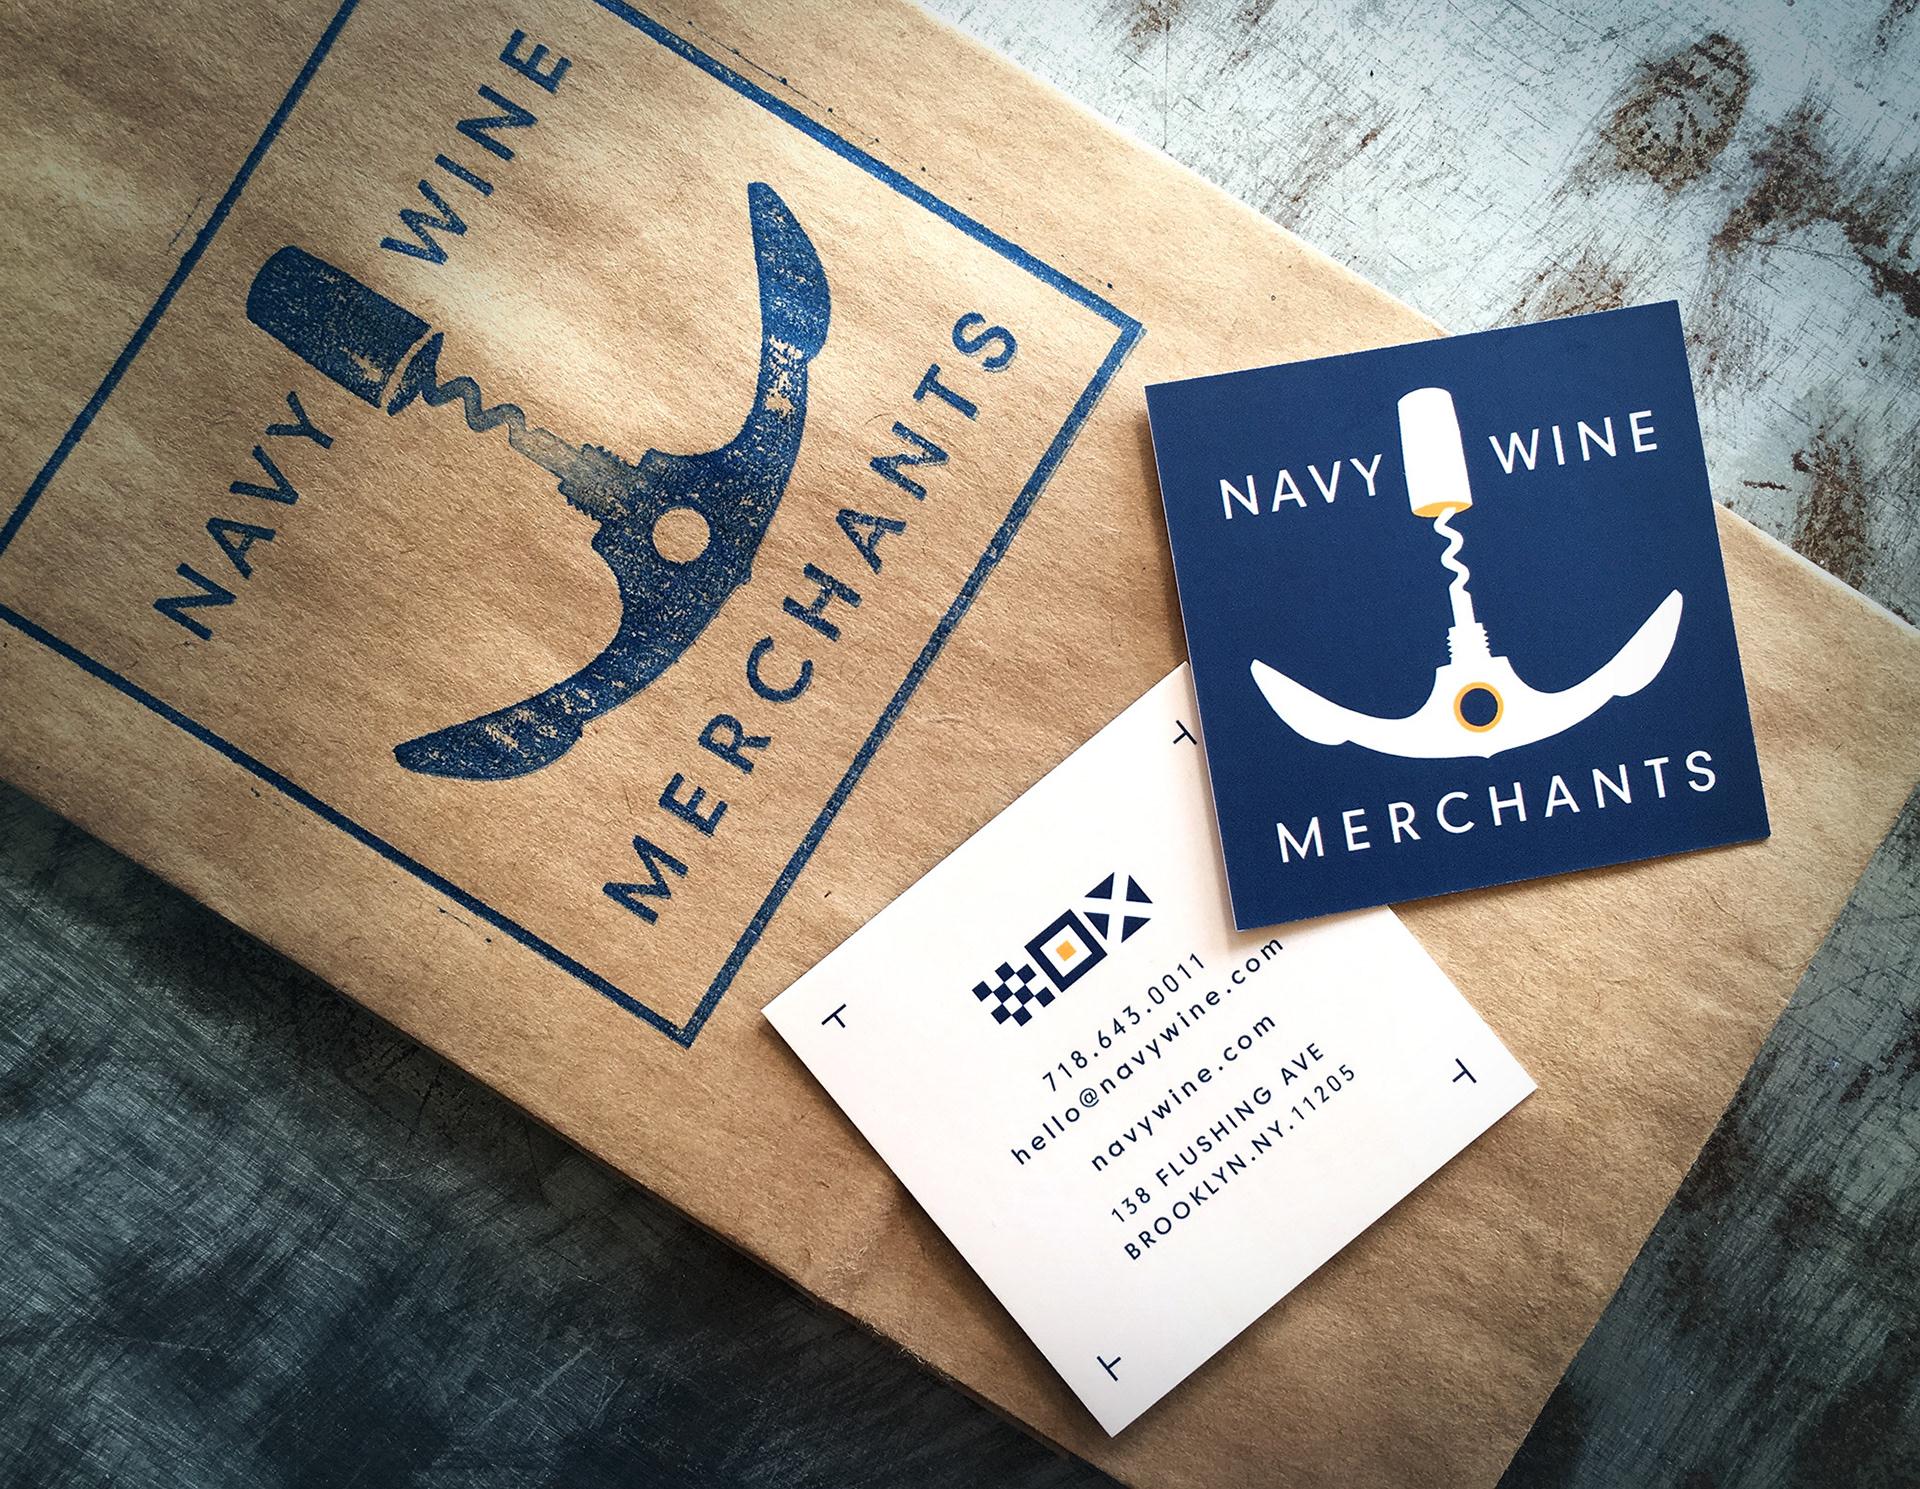 Silo design inc navy wine merchants logo and signage navy wine merchants logo and signage reheart Gallery